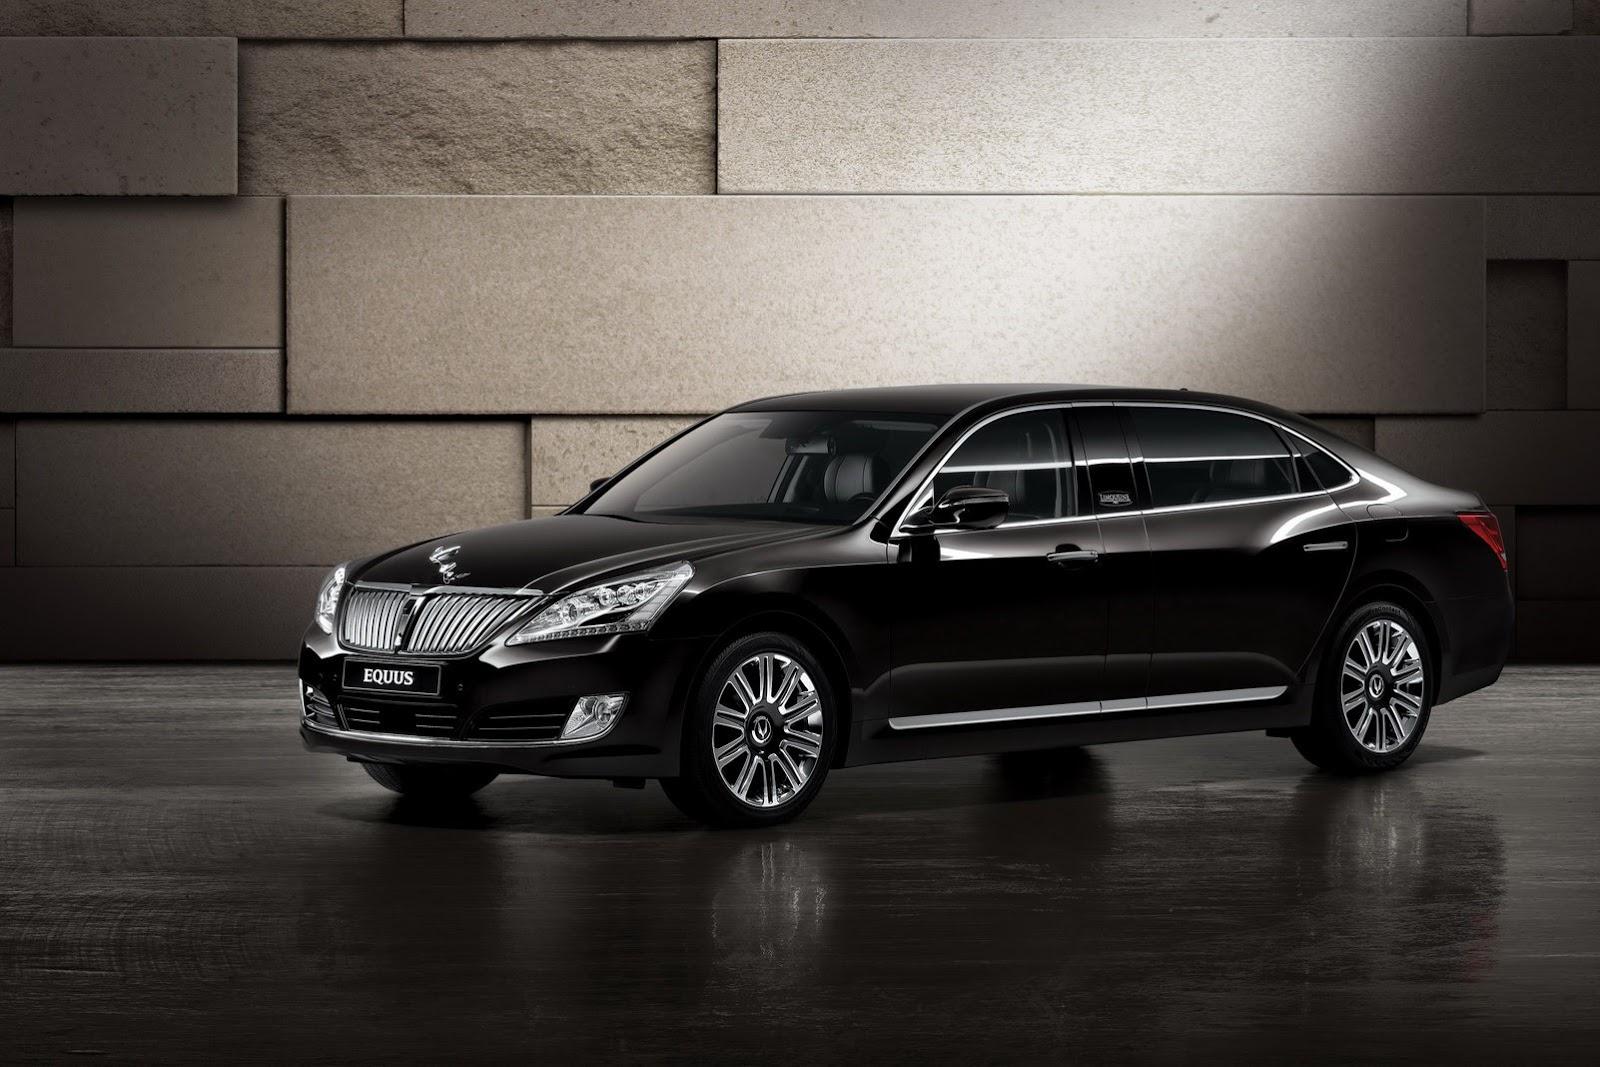 All Cars Nz 2012 Hyundai Equus Limo Bulletproof 2013